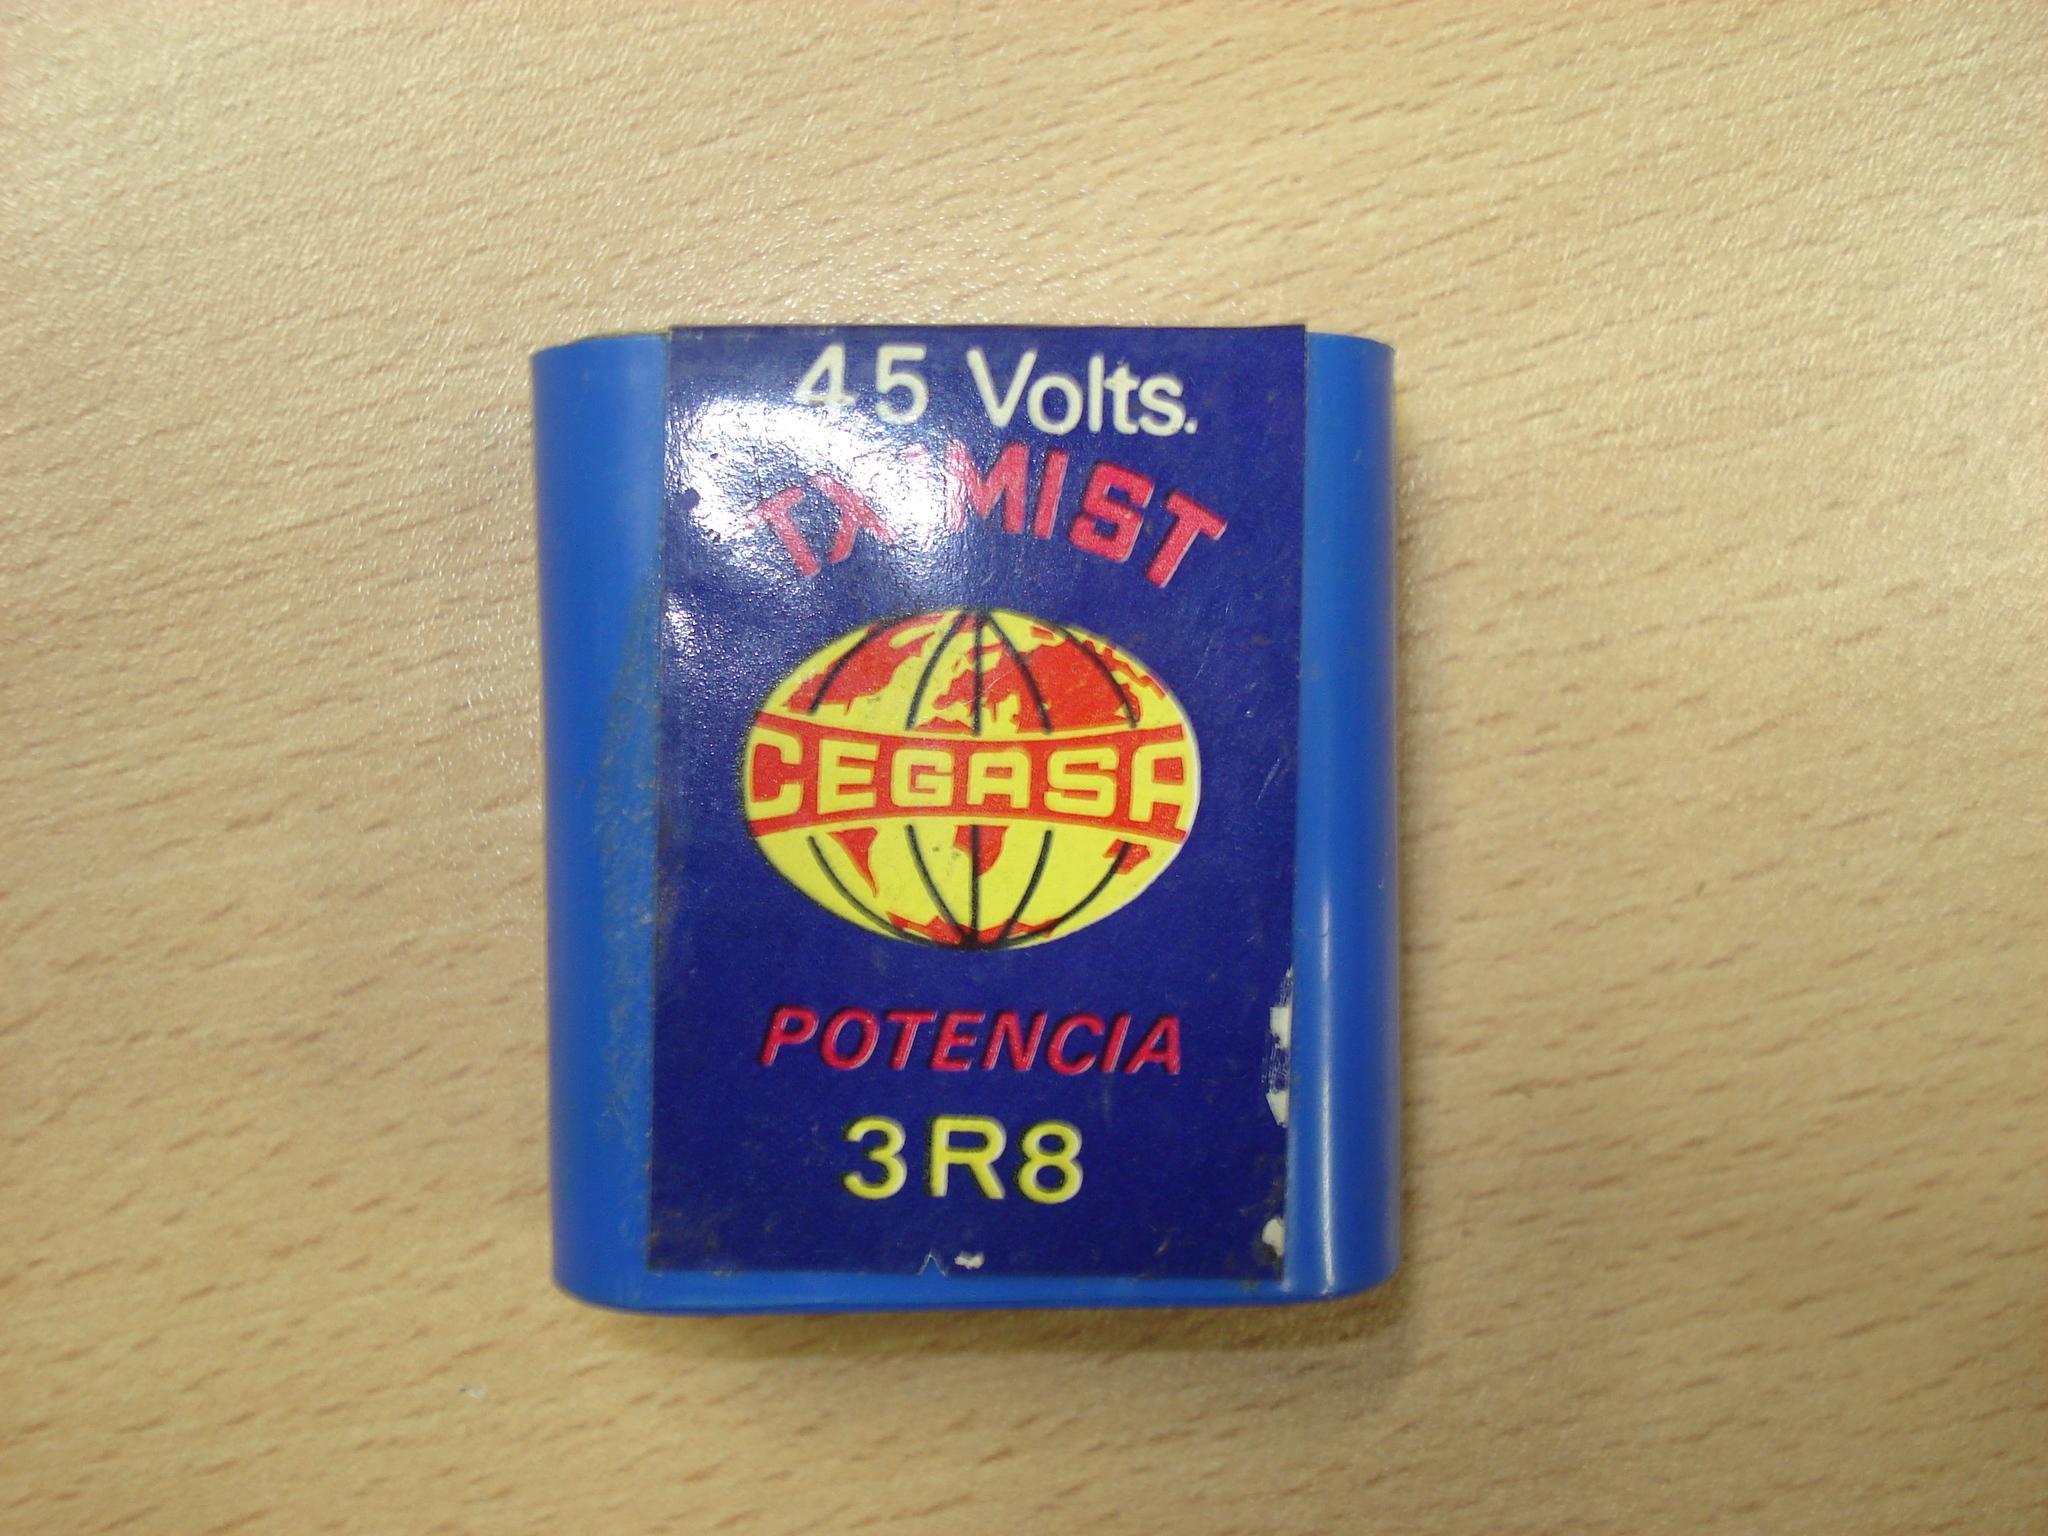 Pila 3R8 -4,5 V- TXIMIST